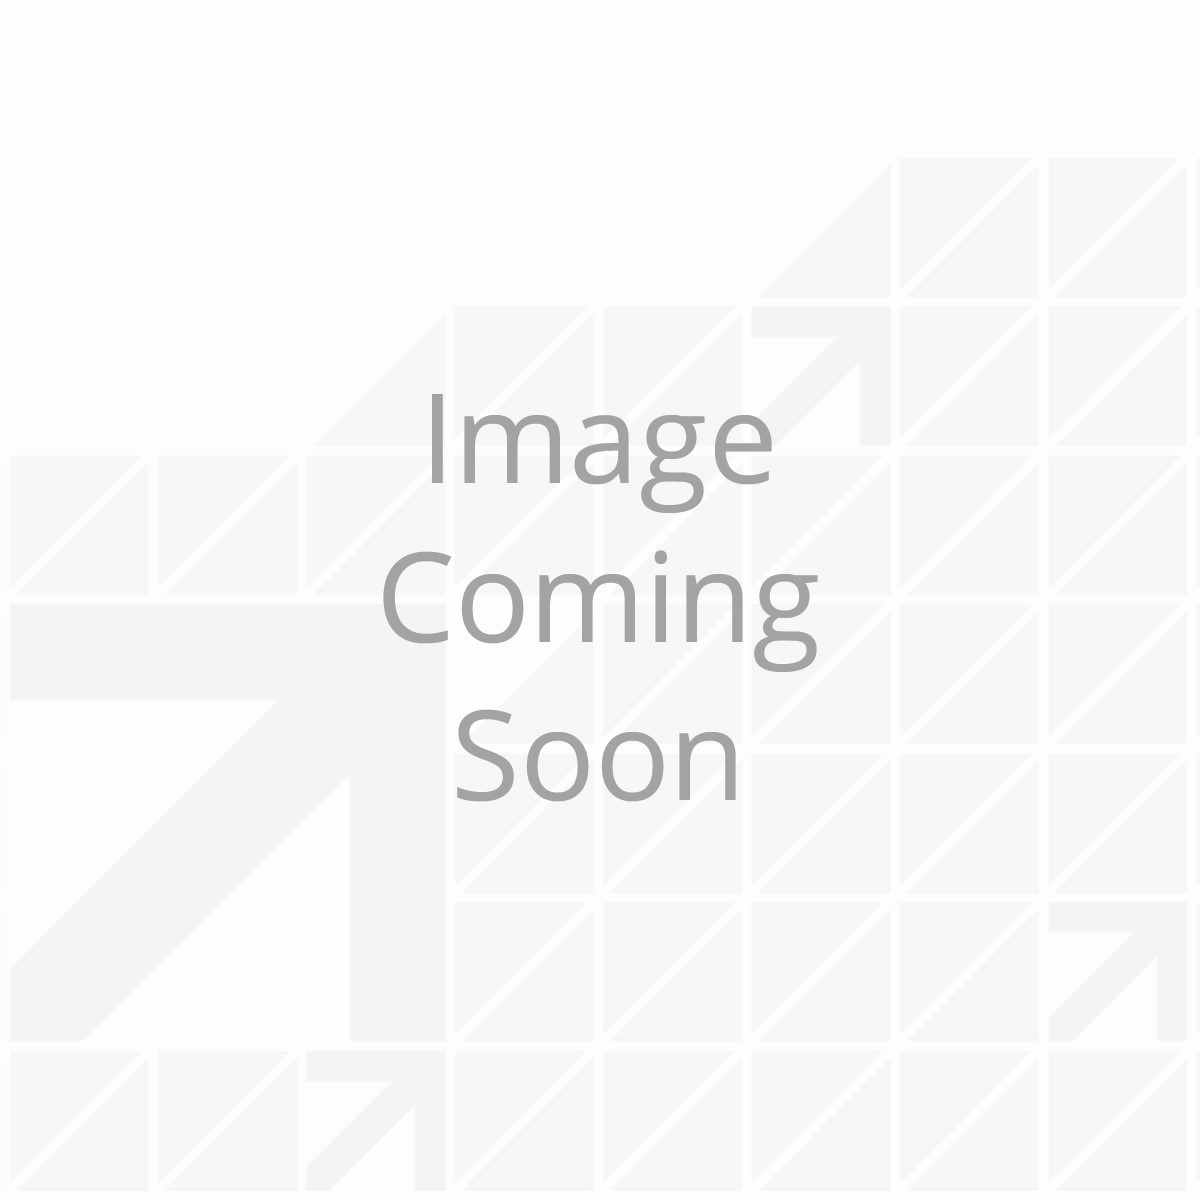 Inner Bearing Cone - Various Sizes